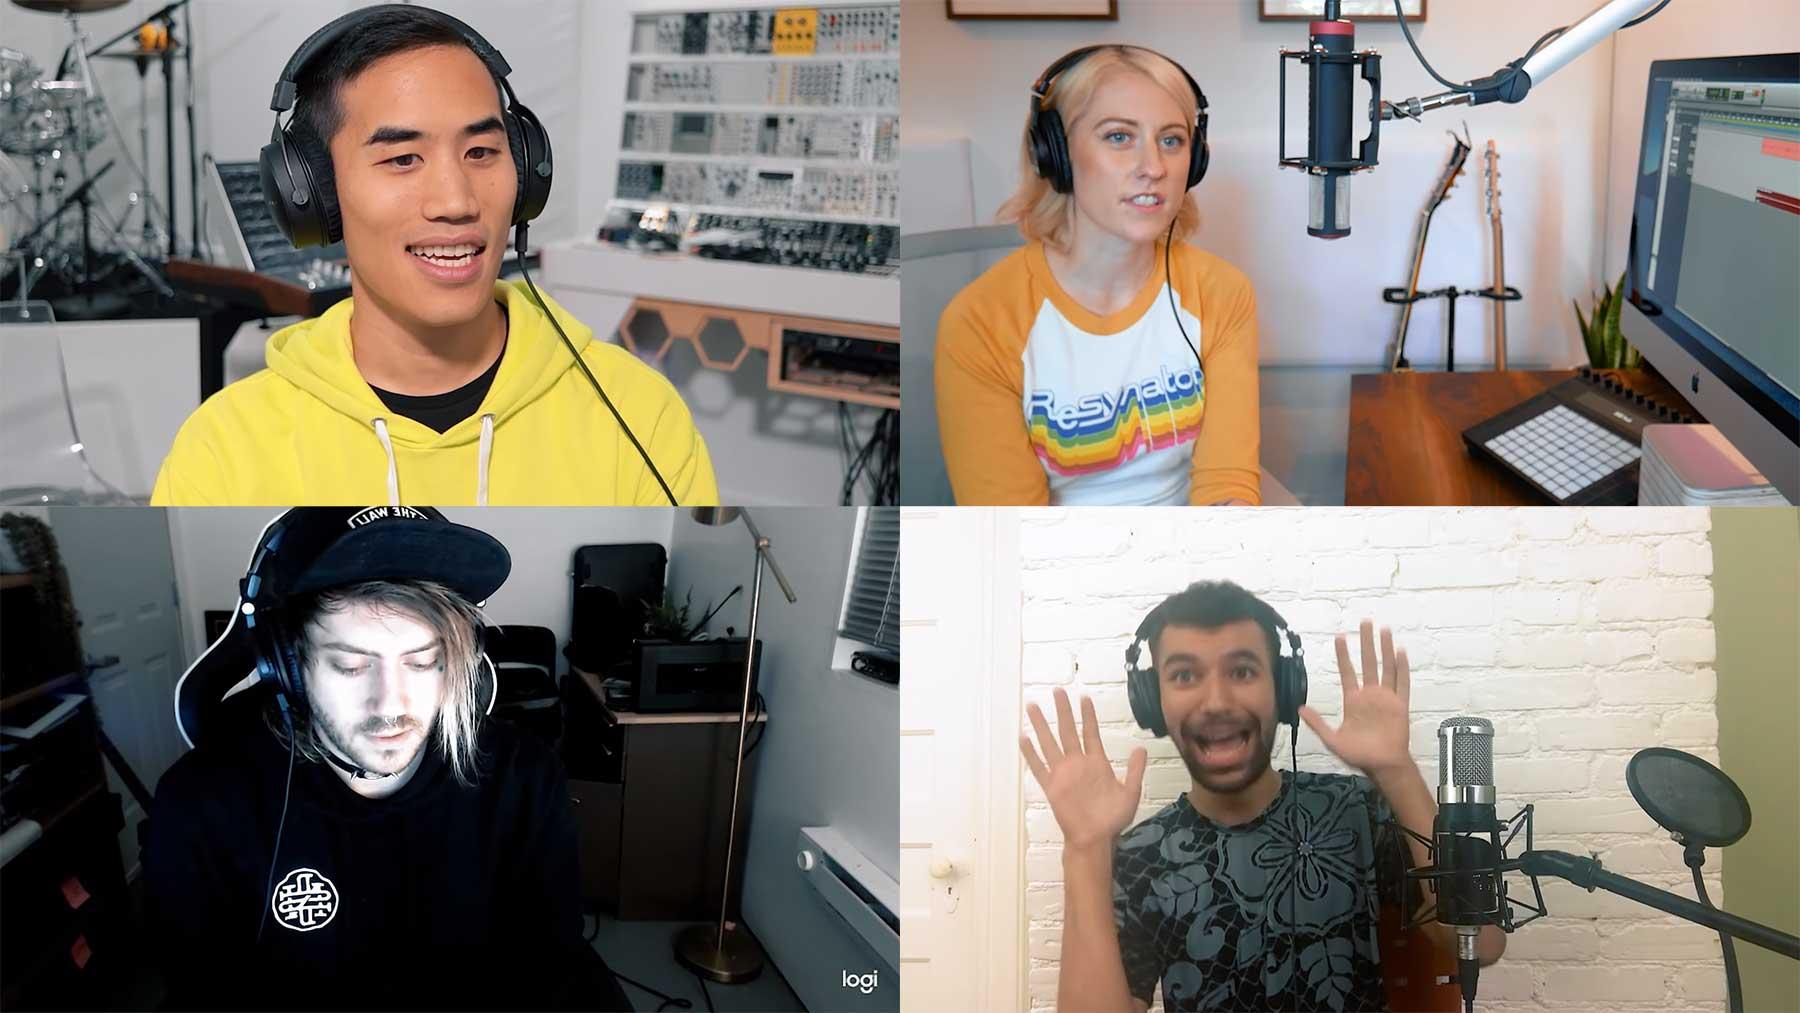 4 MusikproduzentInnen 1 Sample #7 4-PRODUCERS-FLIP-THE-SAME-SAMPLE-7